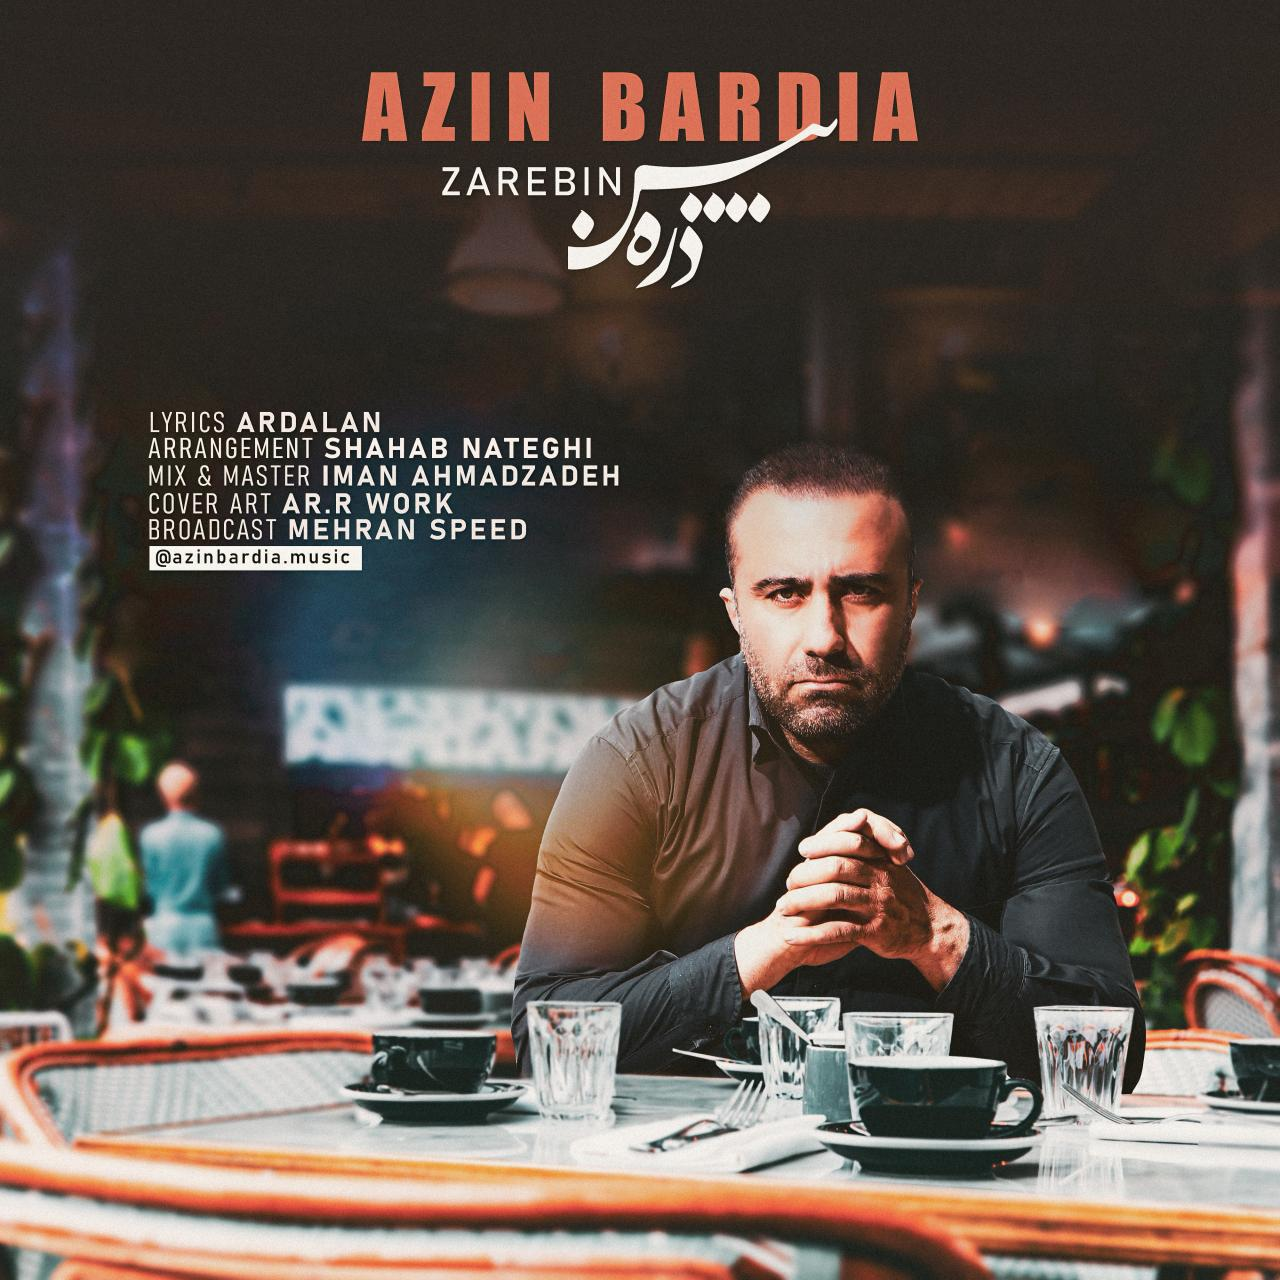 Azin Bardia – Zarebin